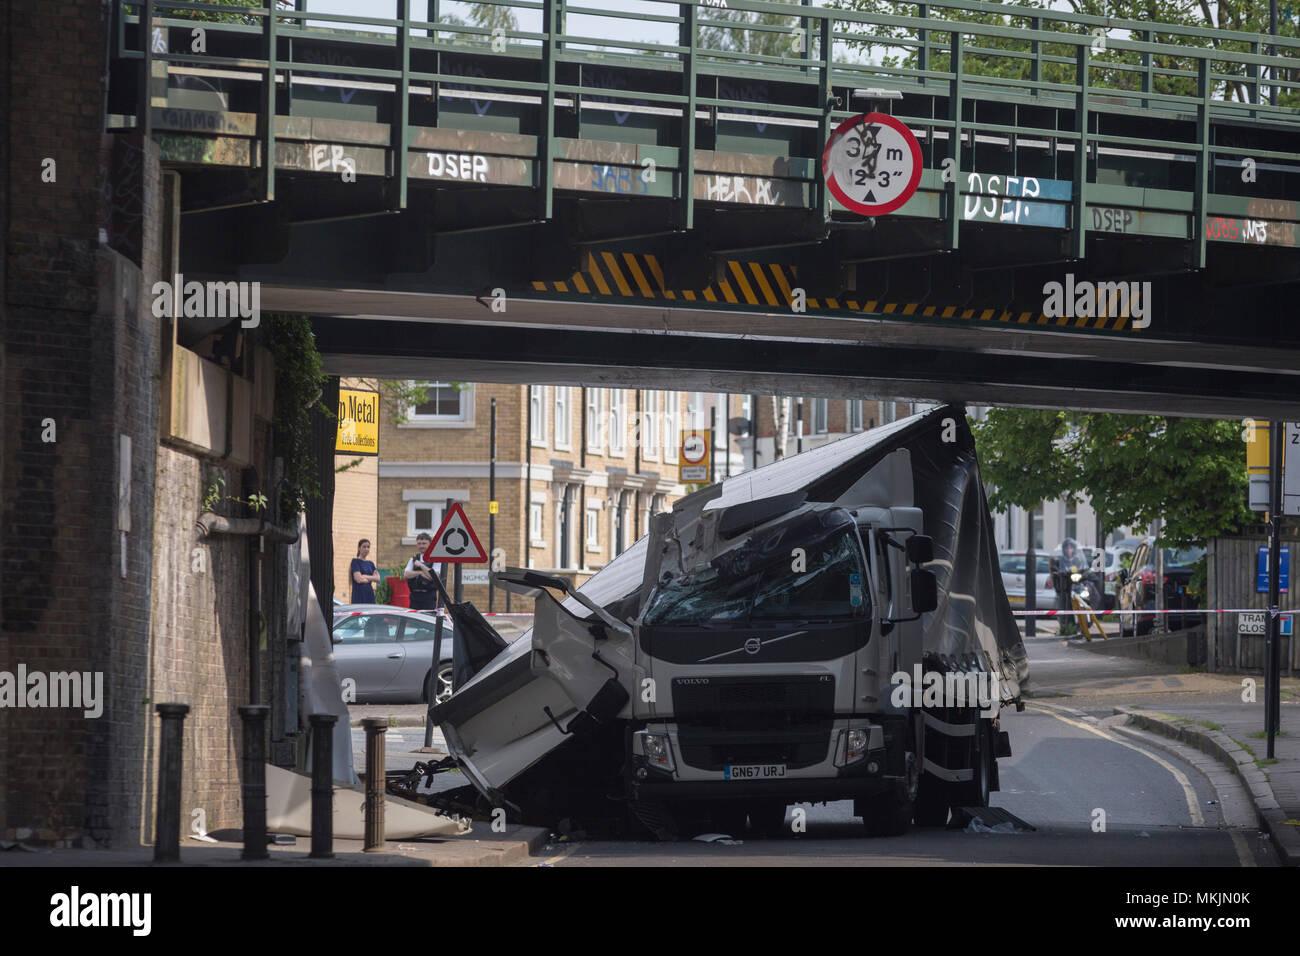 london-uk-8th-may-2018-the-damaged-remai